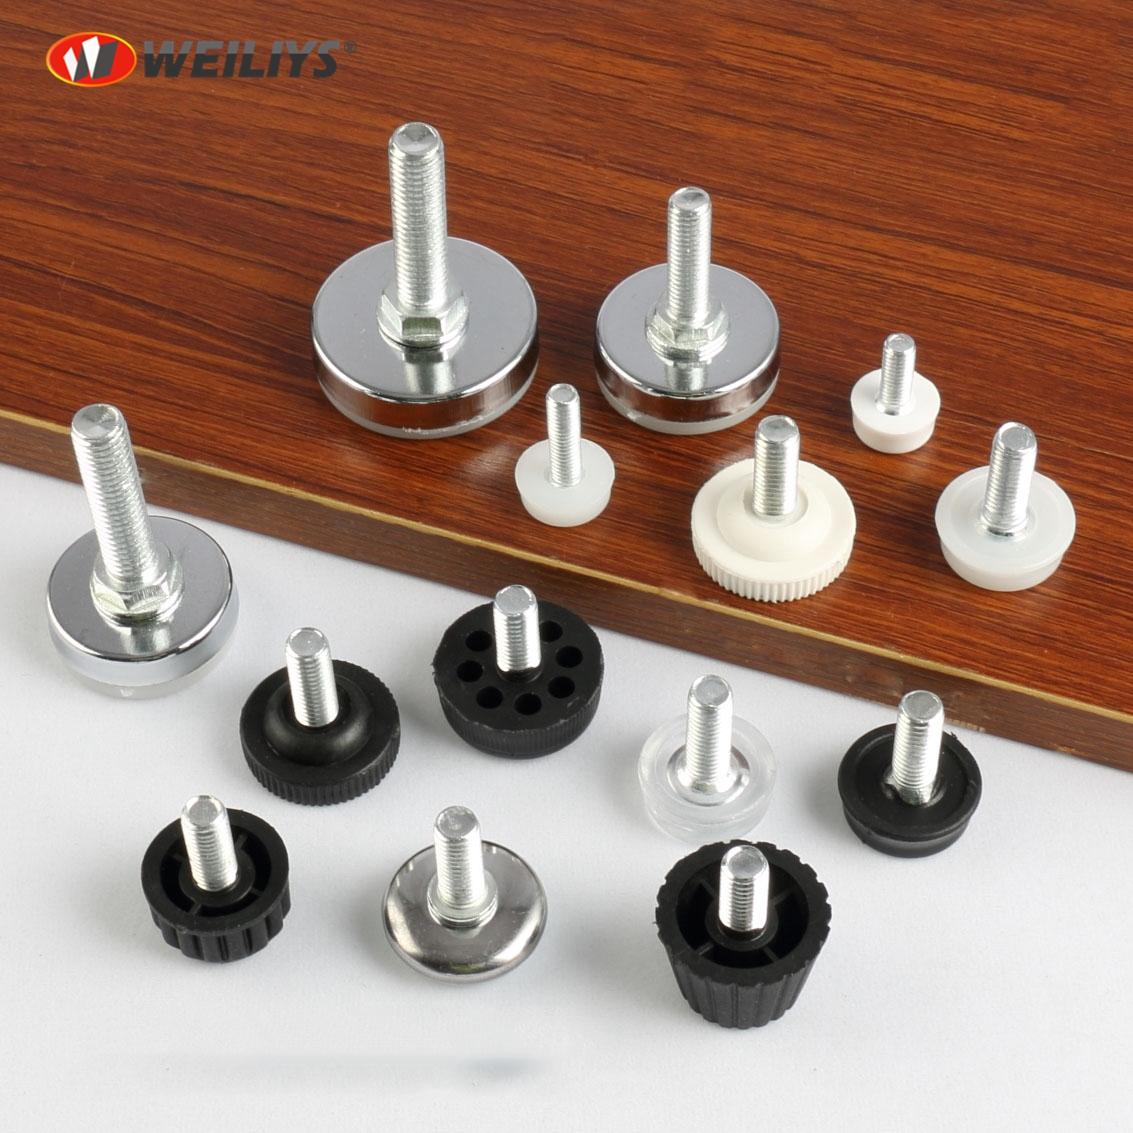 Furniture Levelers 8mX8mm PVC adjustable feet-weiliys.com